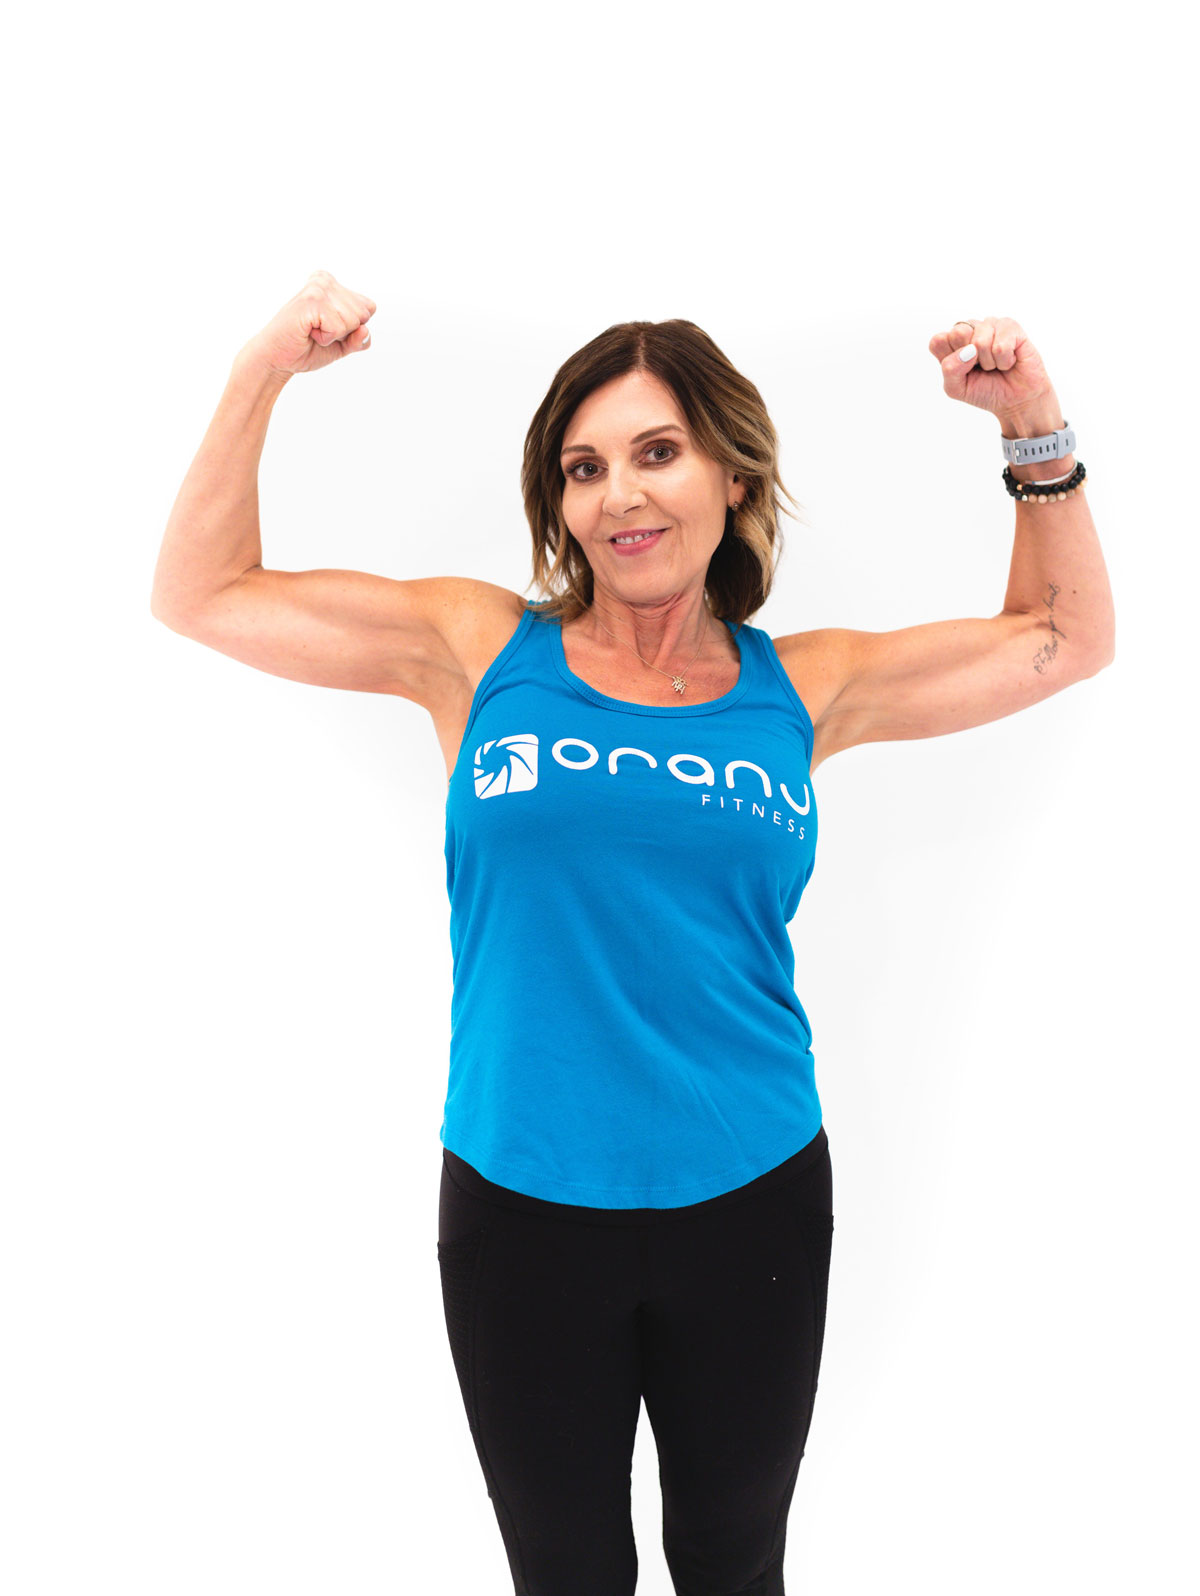 Louise Grant Oranj Fitness Studio